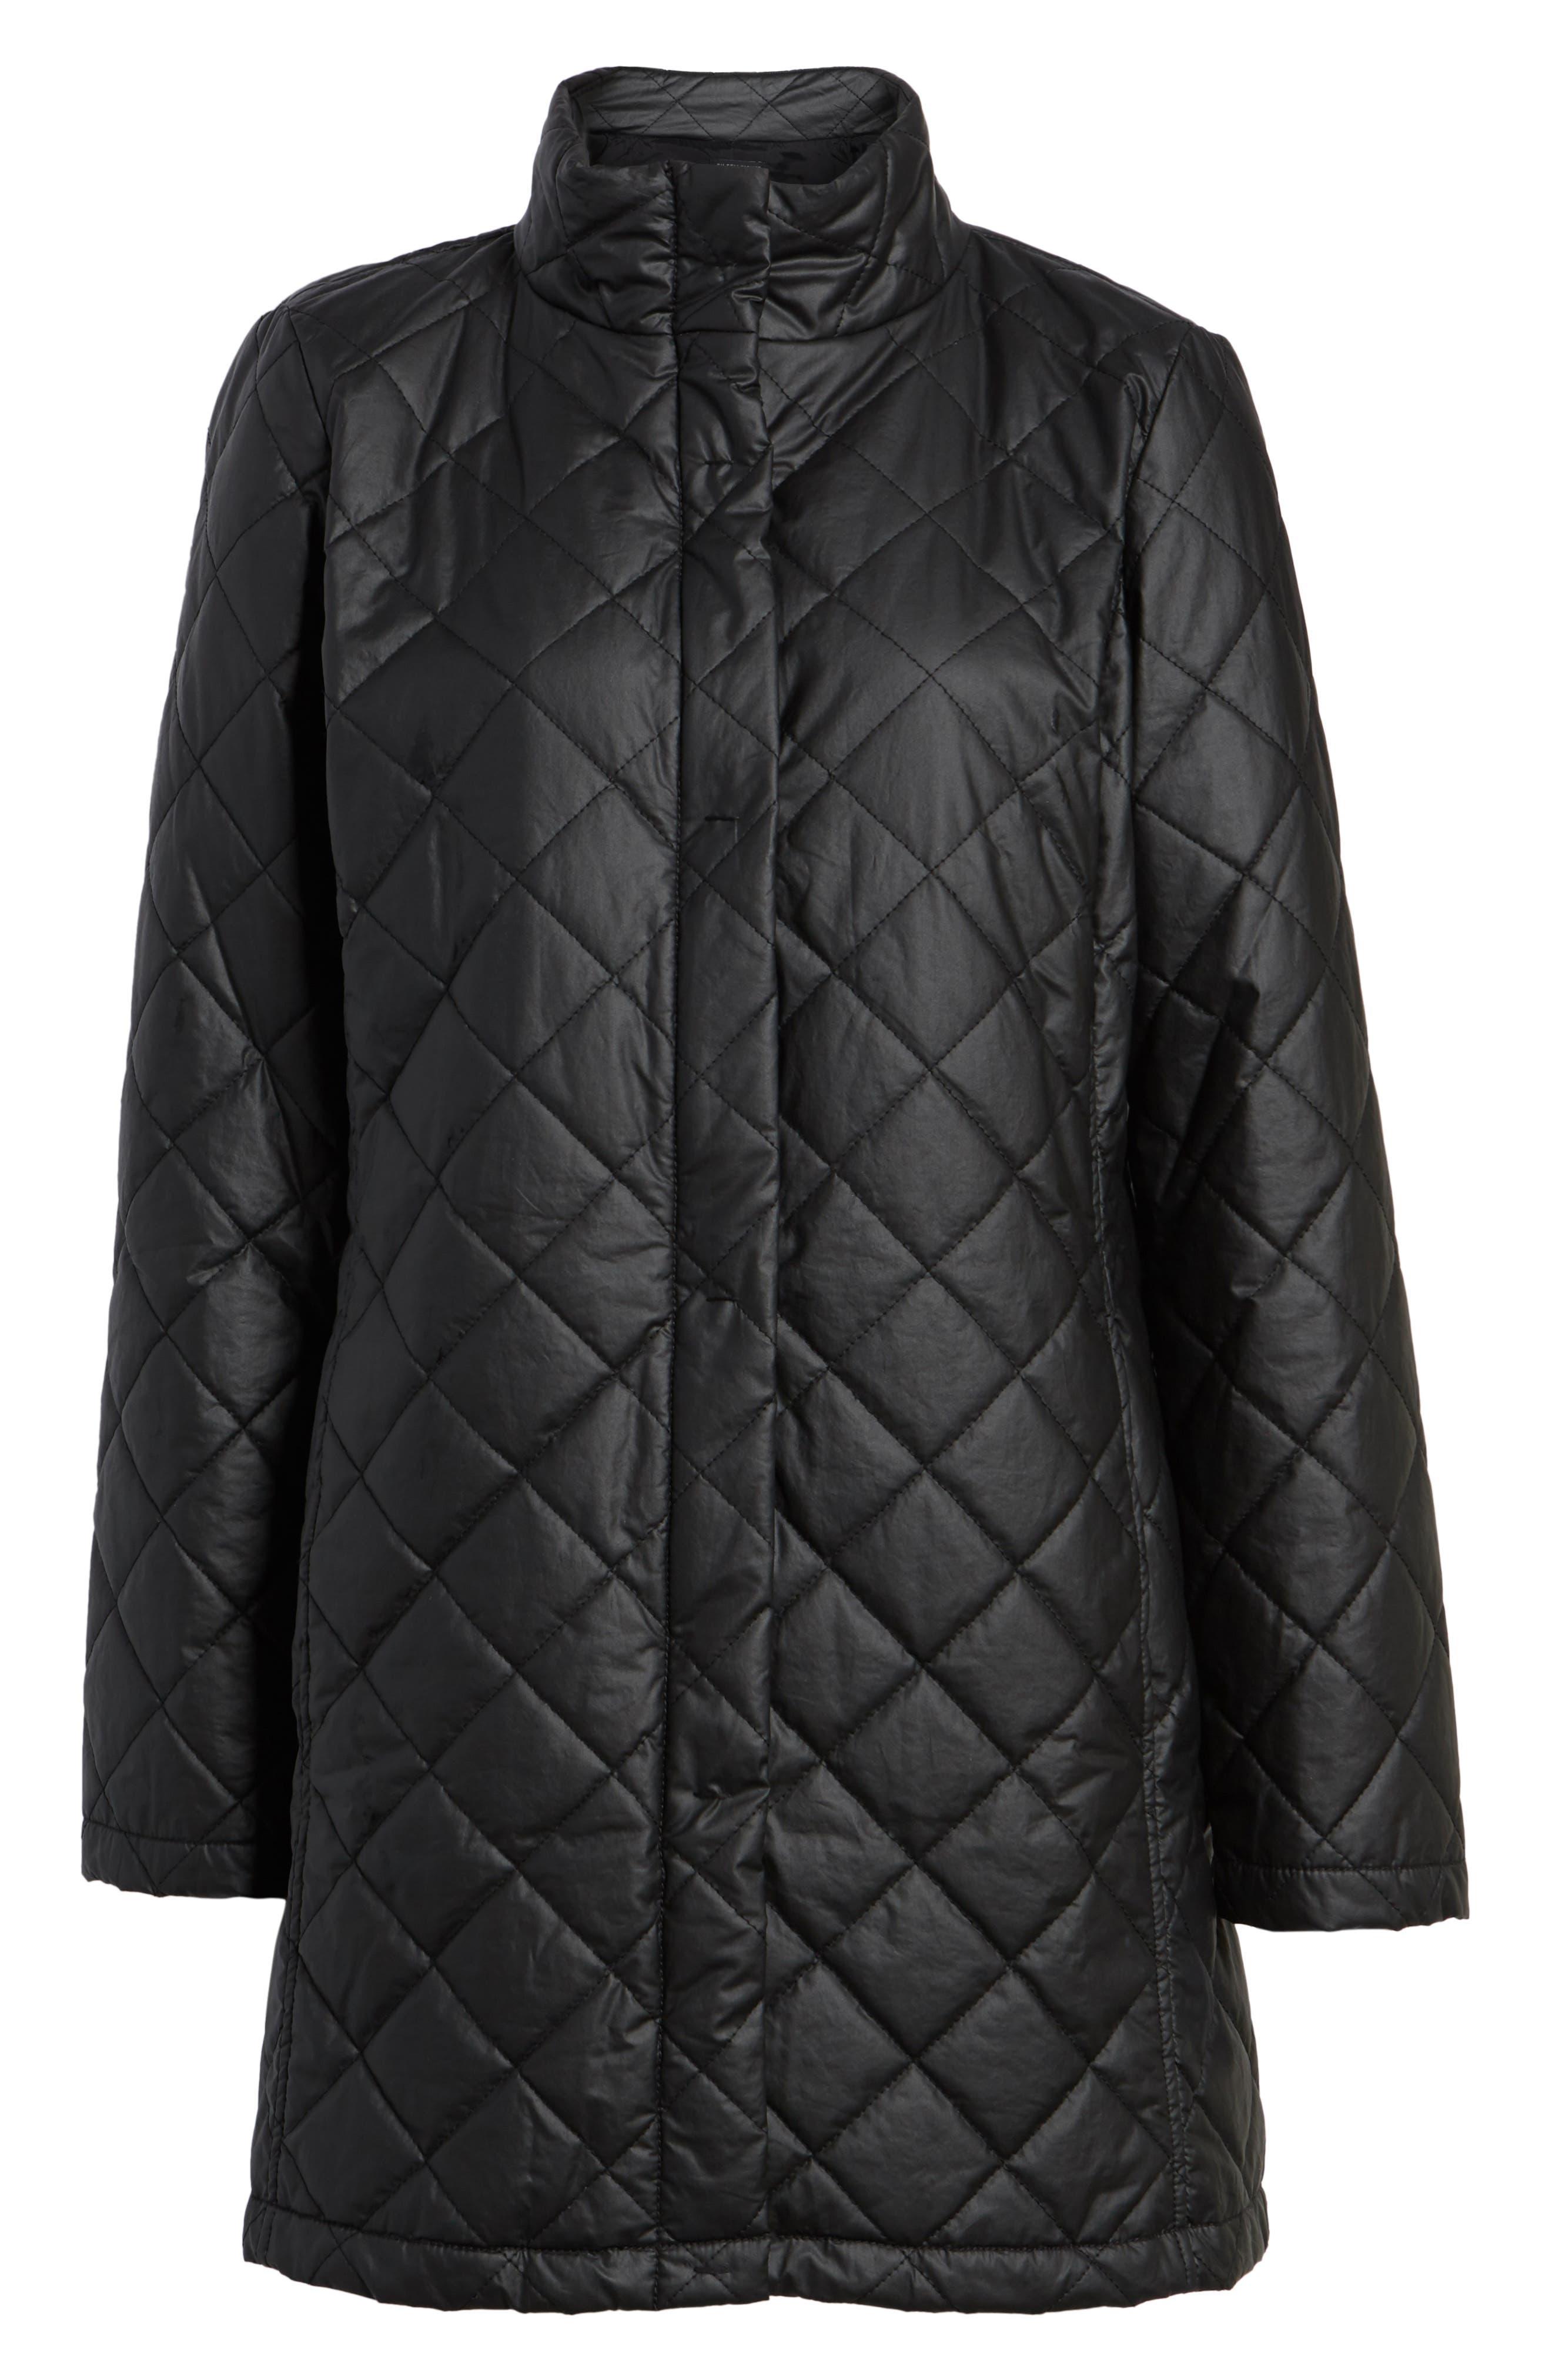 Stand Collar Organic Cotton Jacket,                             Alternate thumbnail 6, color,                             Black